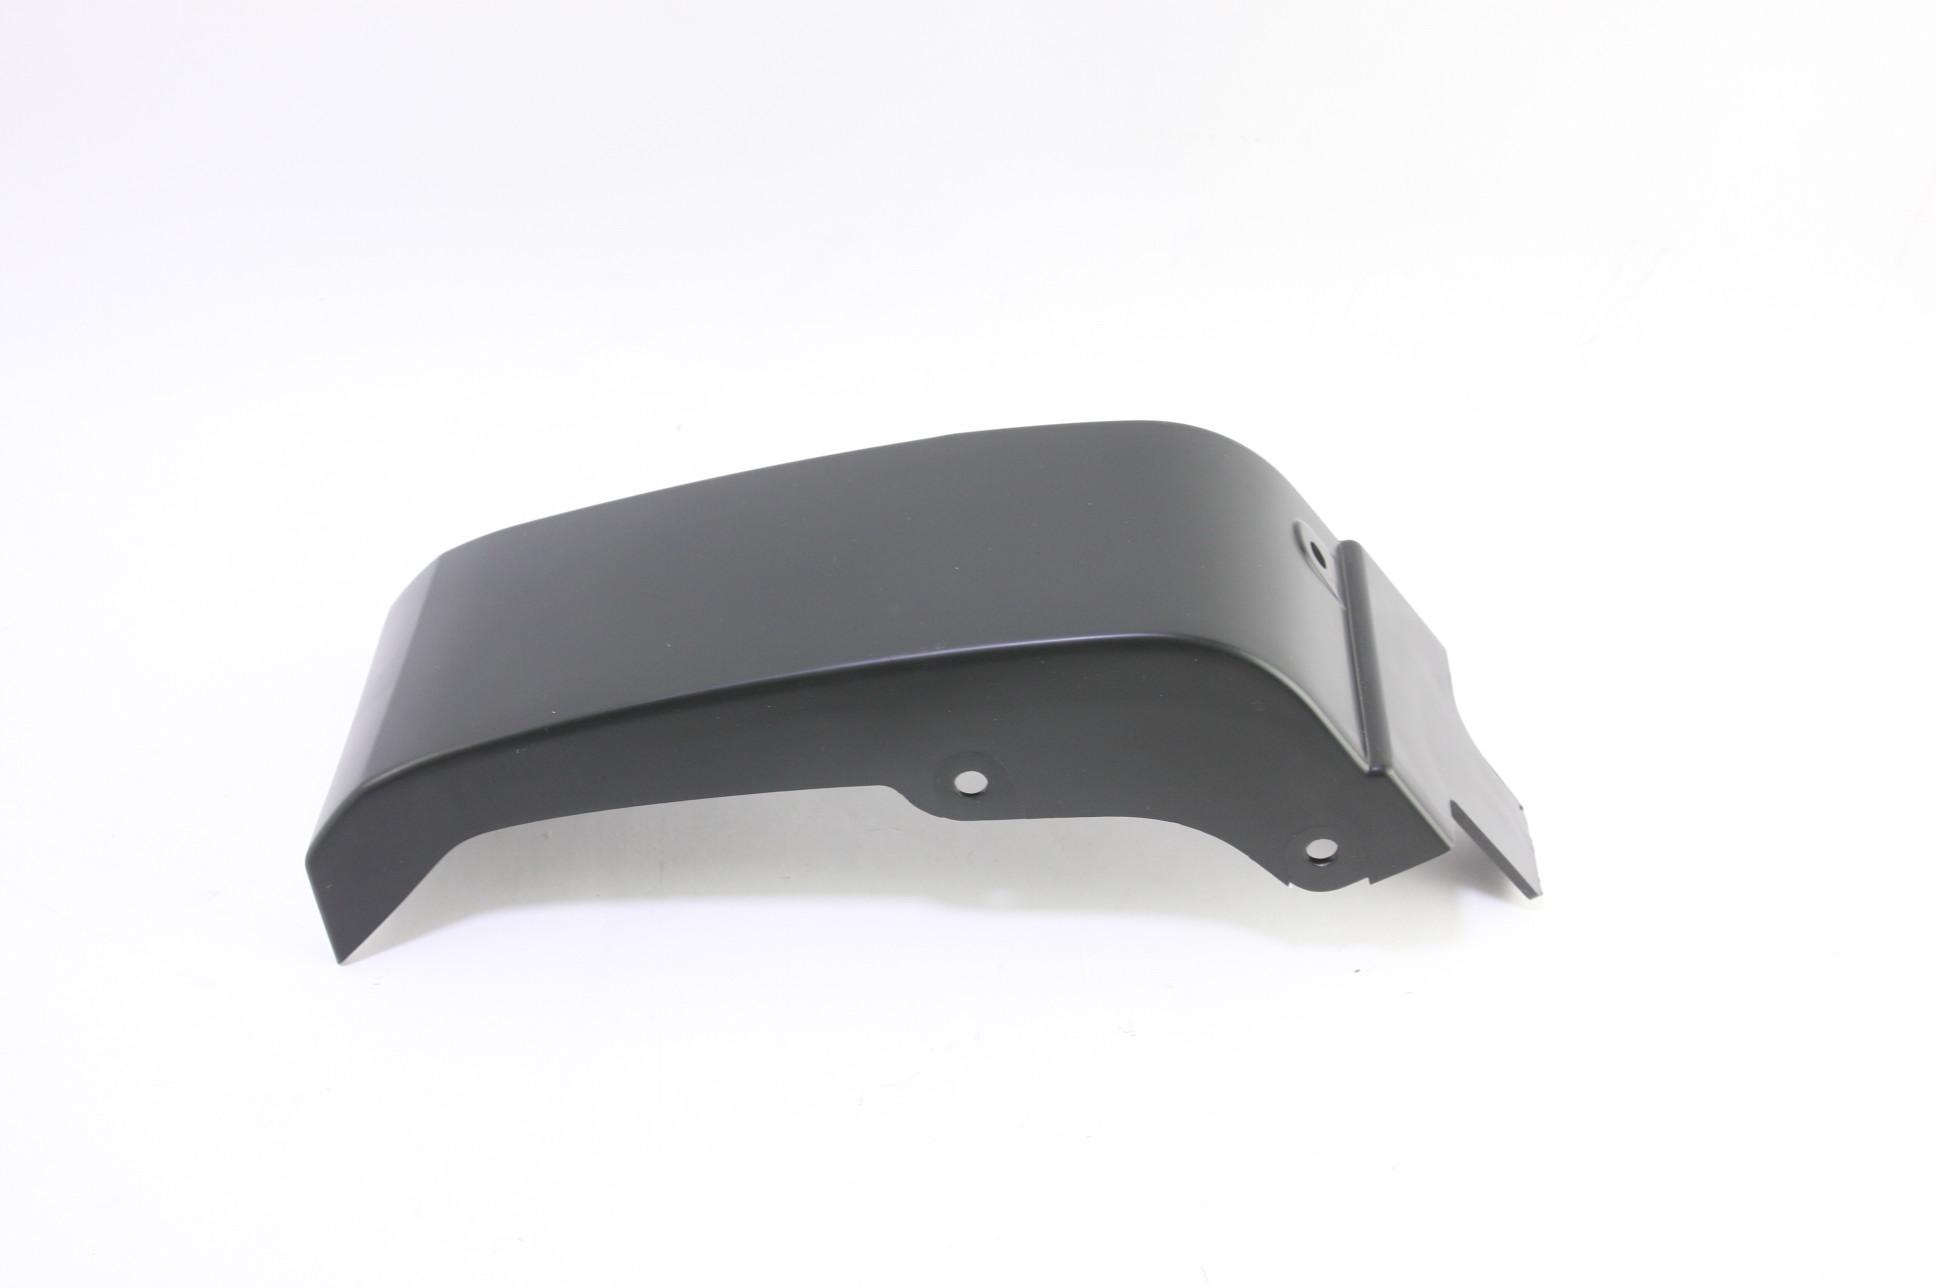 *~ New OEM Hyundai 8771126500 Front LH Exterior Fender Moulding 05-06 Santa Fe - image 1